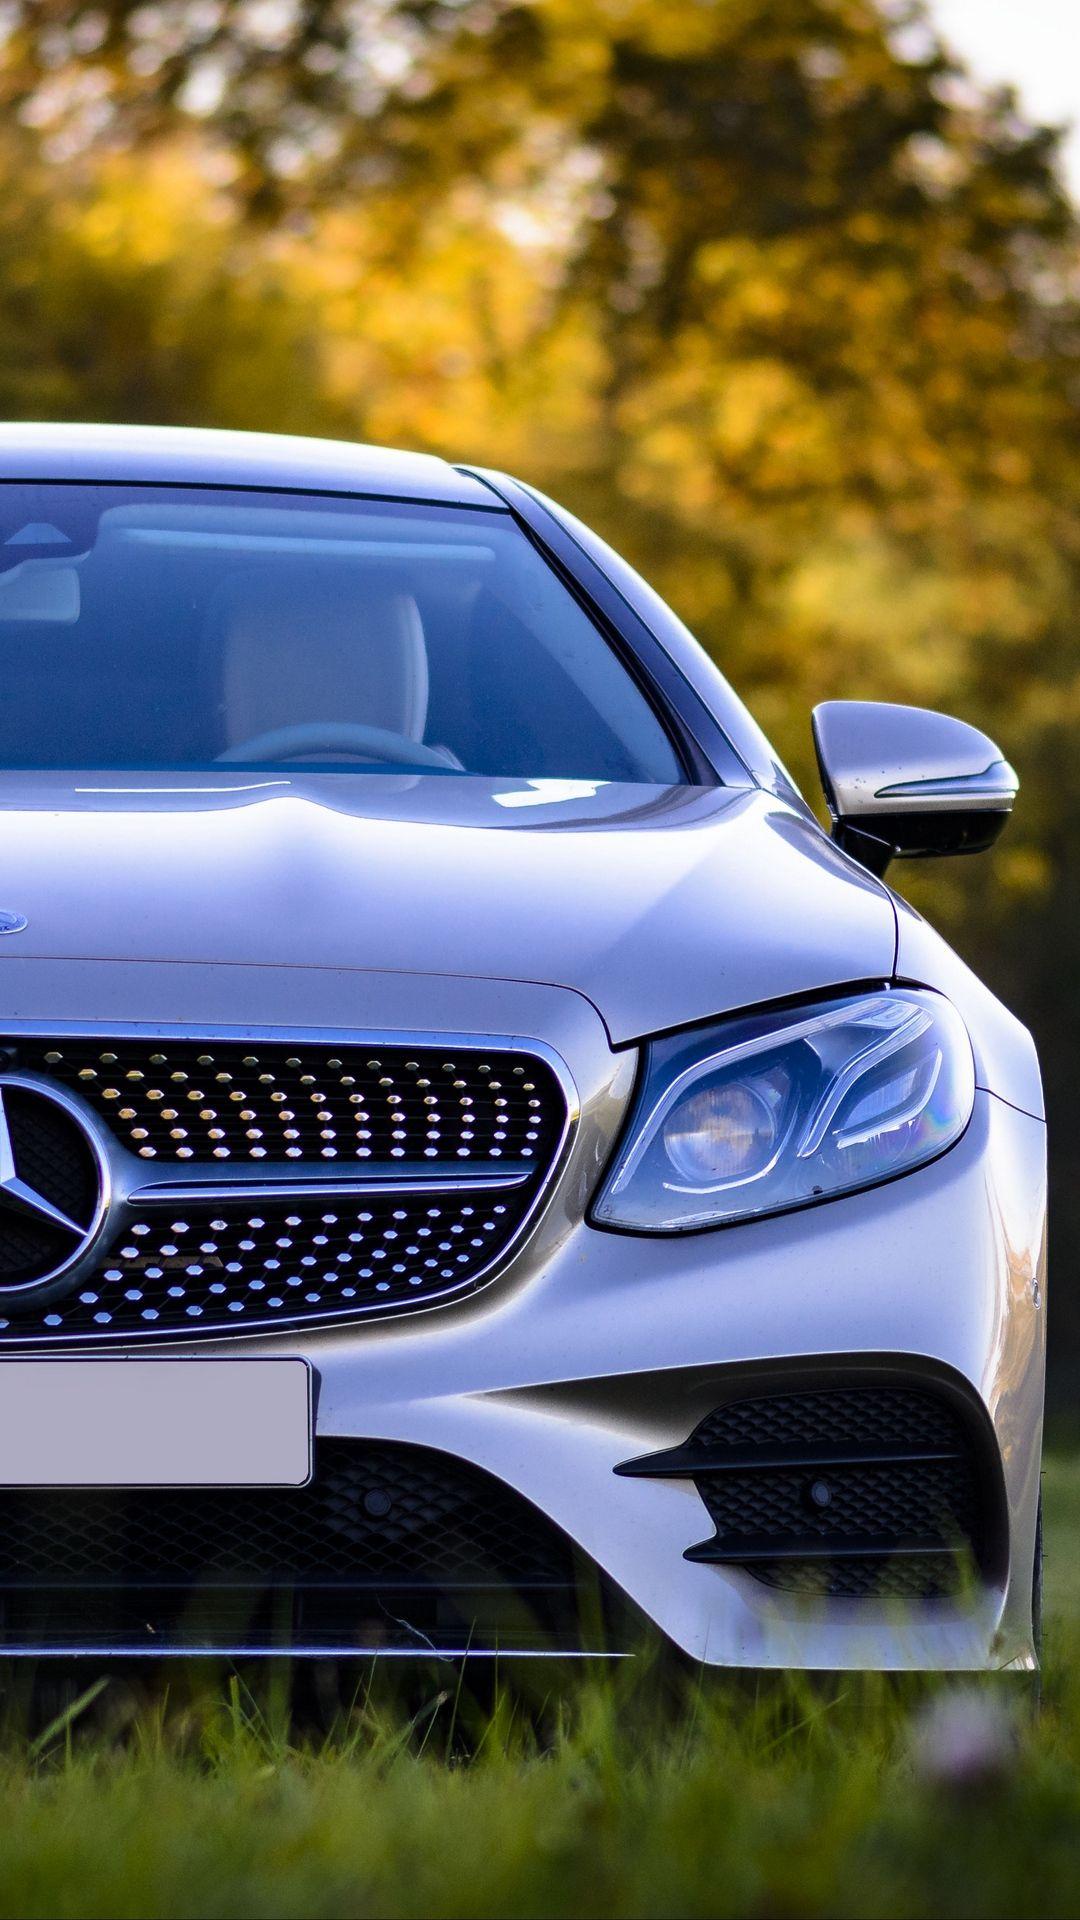 Mercedes Benz Wallpaper Phone | Biajingan Wall